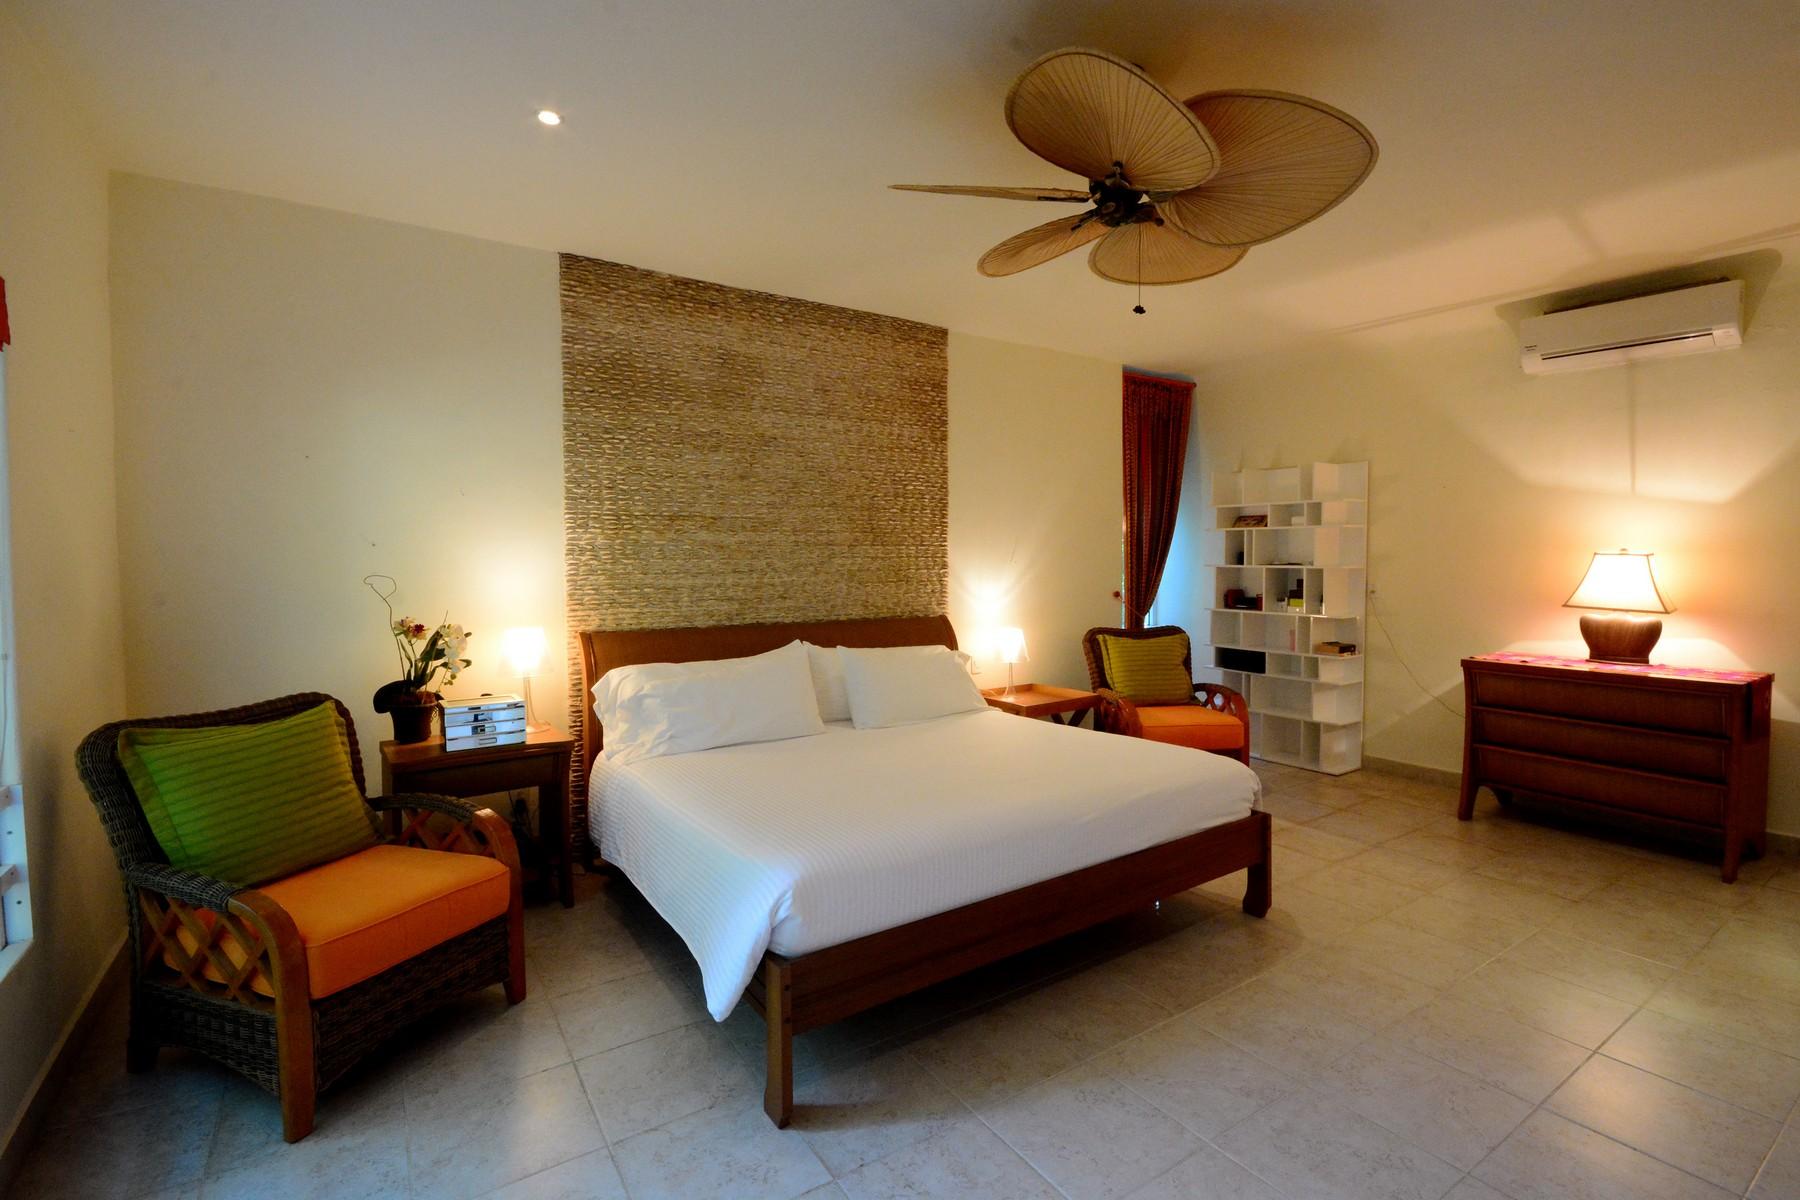 Additional photo for property listing at CASA CARLOTTA Casa Carlotta Paseo Xaman Ha, lot 53, mza 22, Club Real Playa Del Carmen, Quintana Roo 77710 México